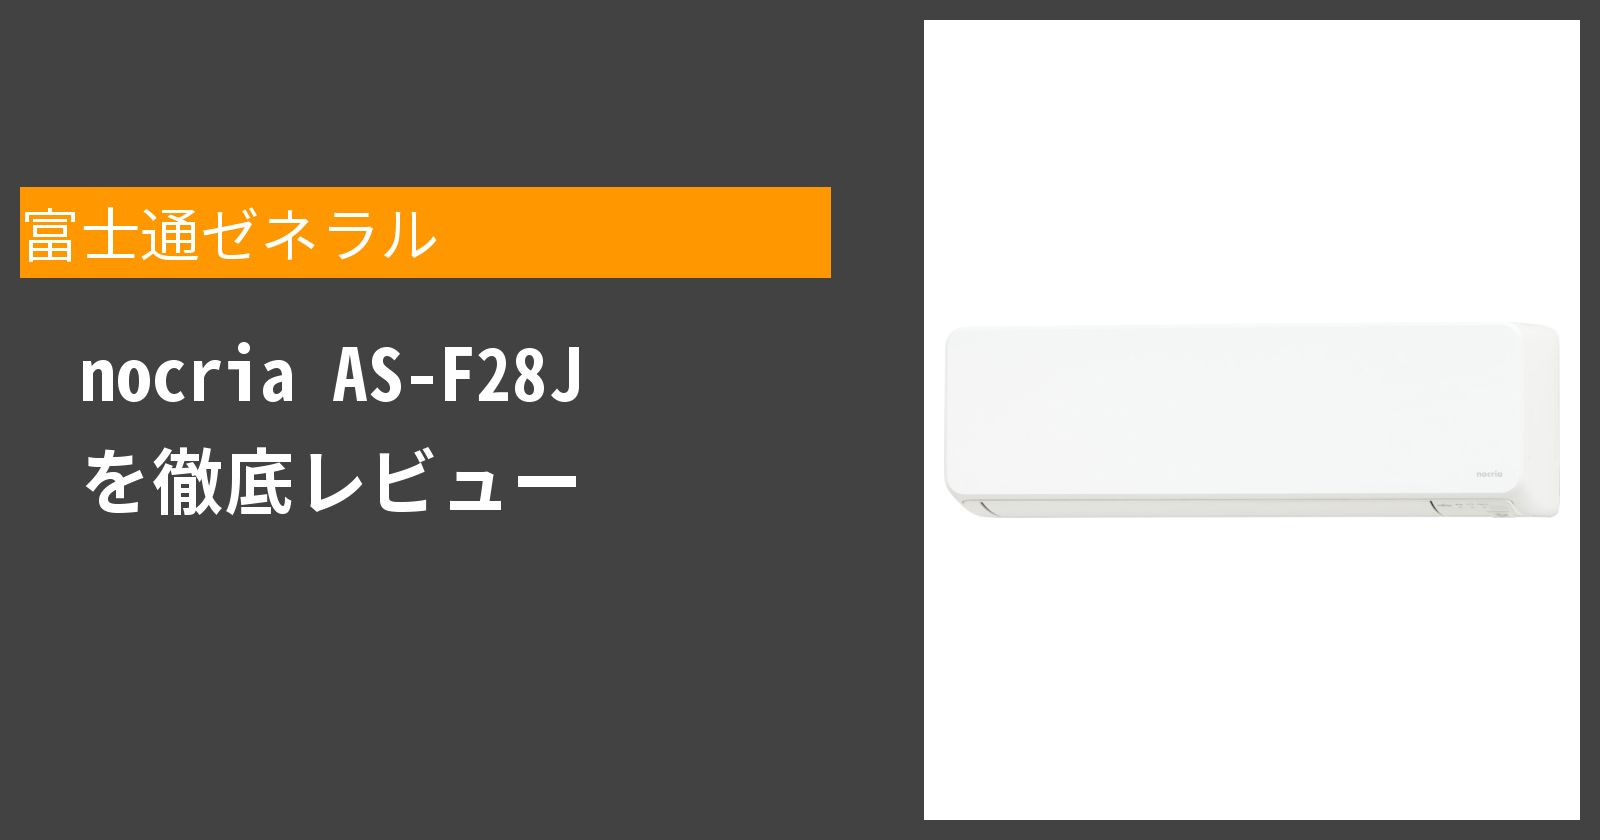 nocria AS-F28Jを徹底評価